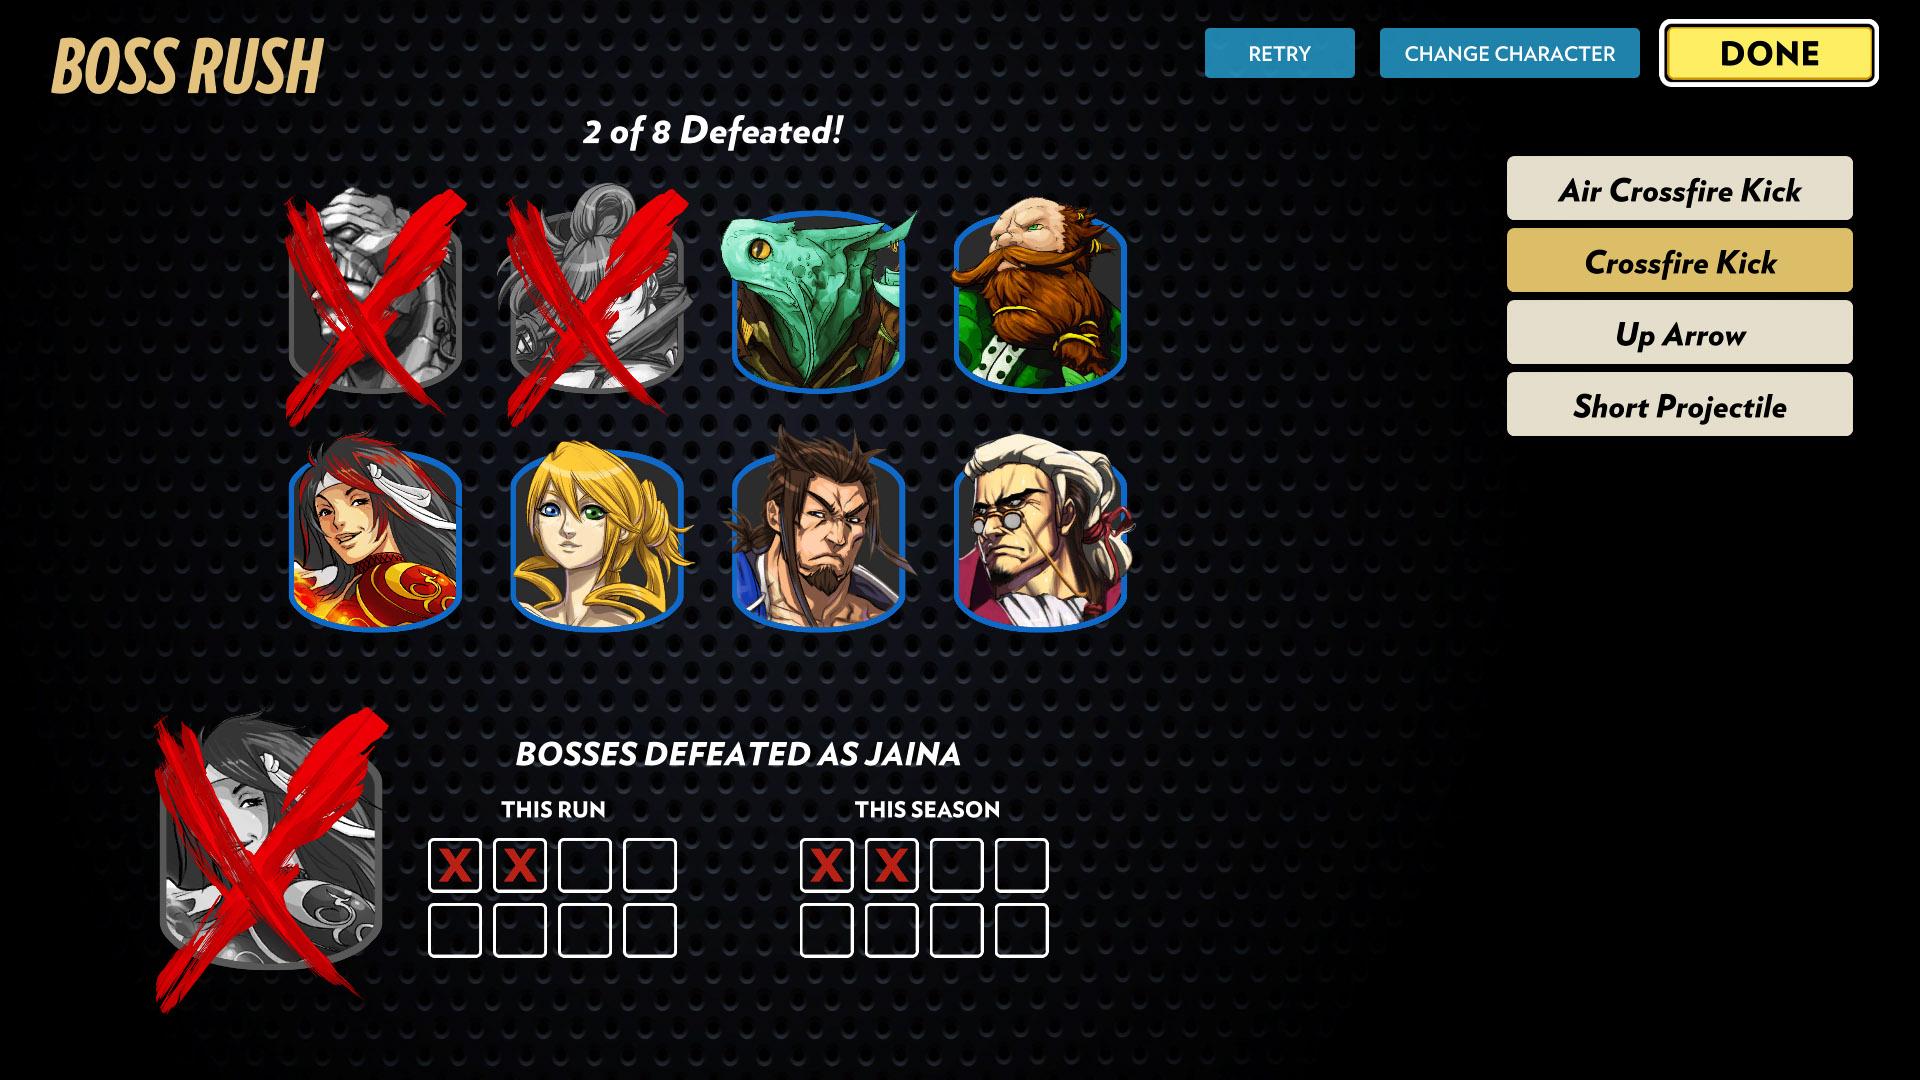 fantasystrike_bossrush_results_screen.jpg